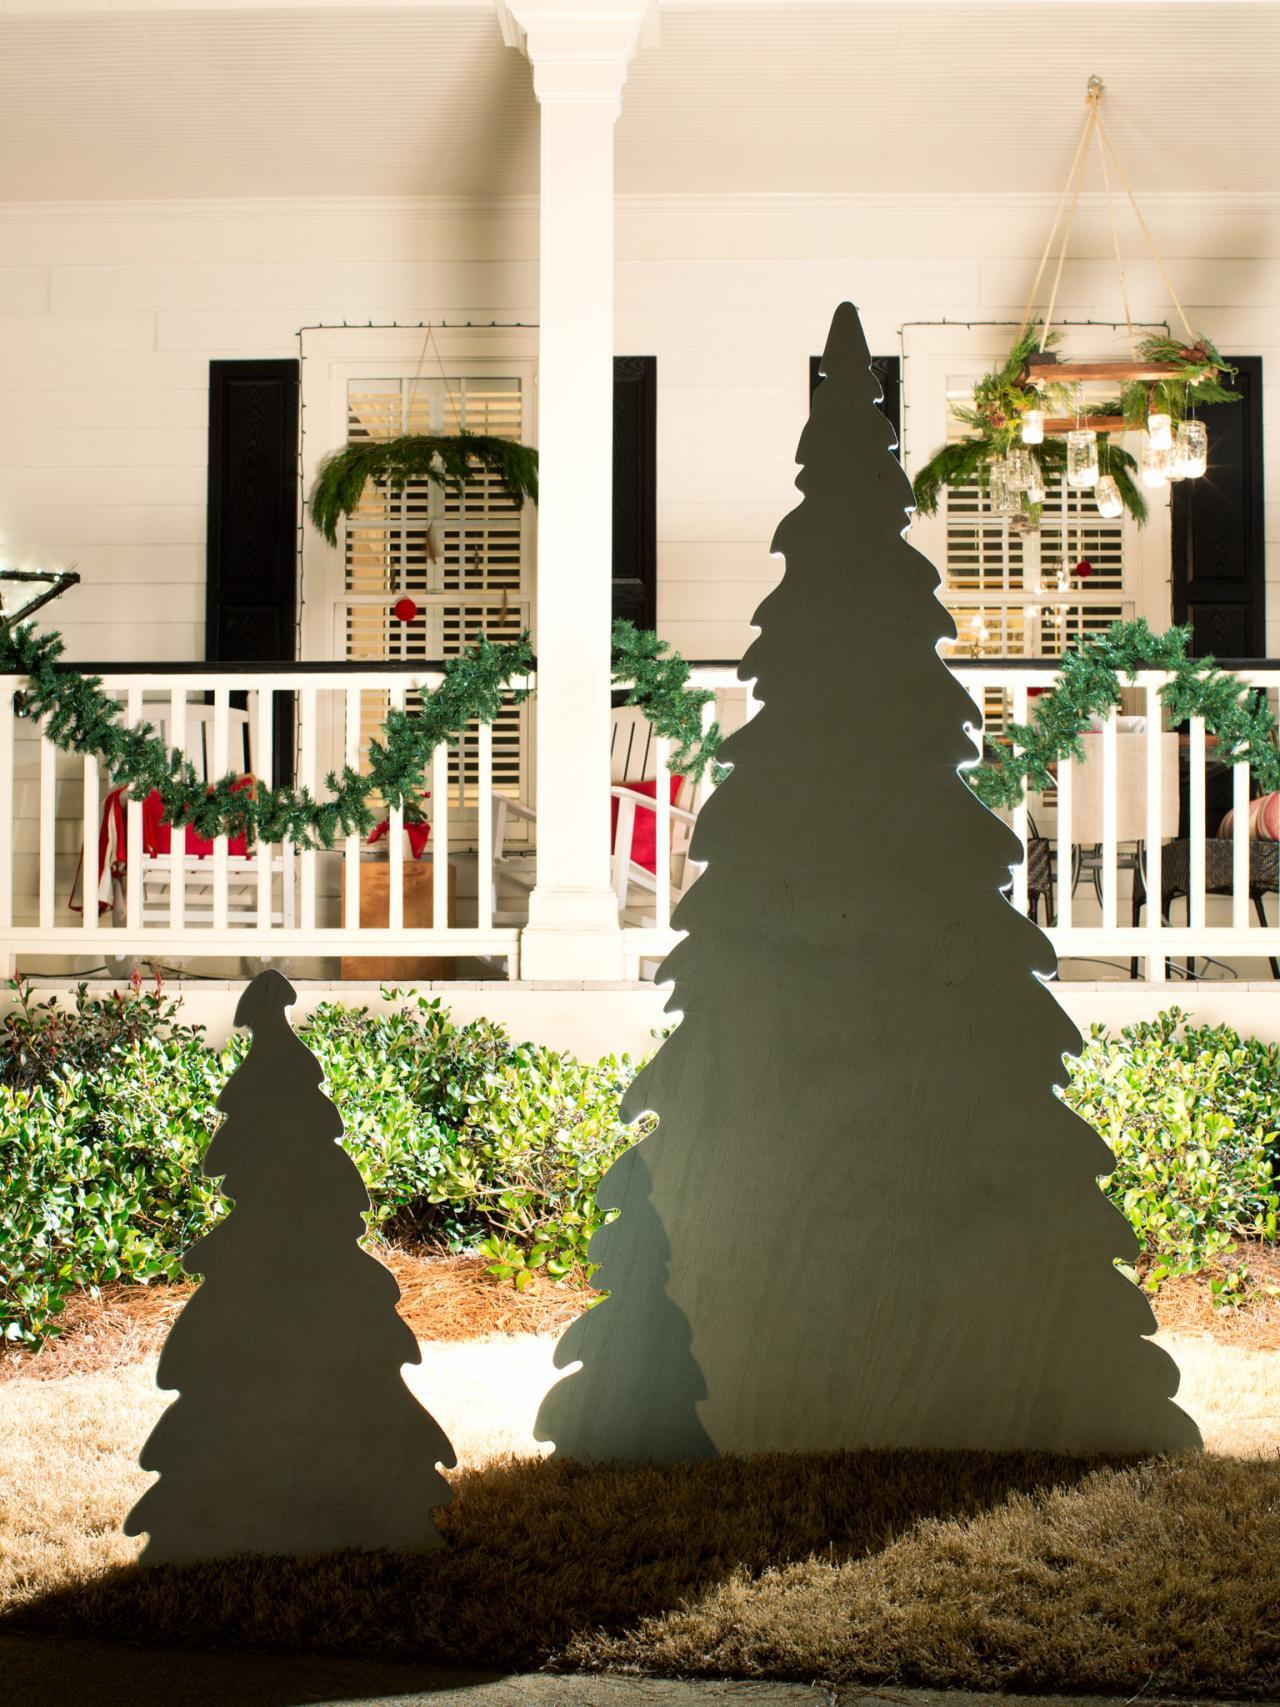 How to decorate tall outdoor christmas tree - Alternative Christmas Tree Ideas Hgtv S Decorating Design Blog Hgtv